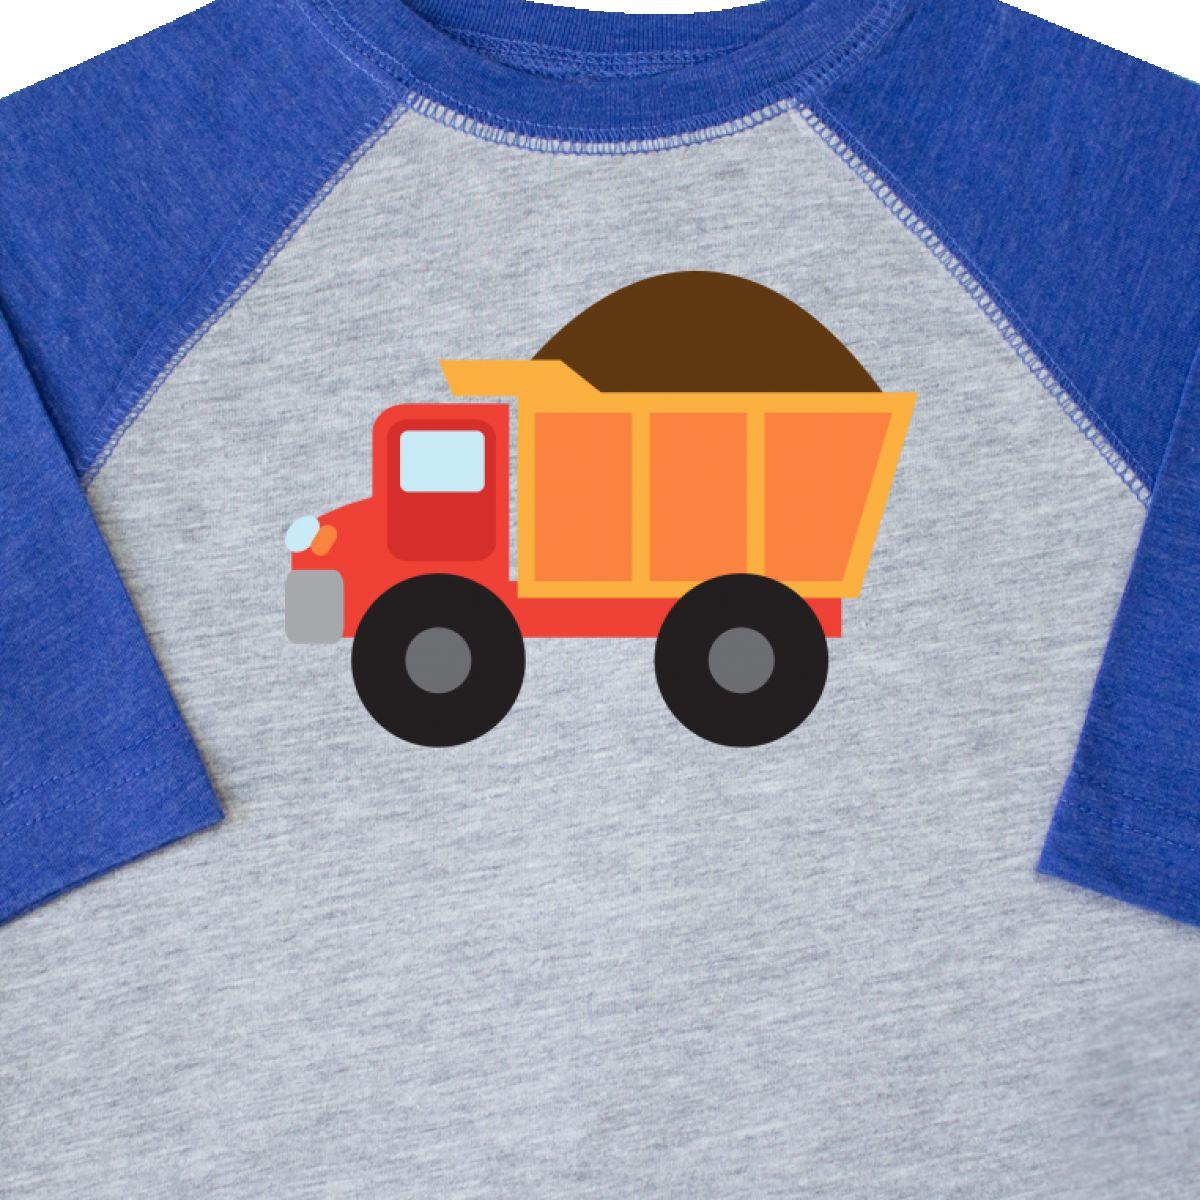 Inktastic-Work-Truck-Construction-Vehicle-Toddler-T-Shirt-Trucks-Vehicles-Cute thumbnail 10